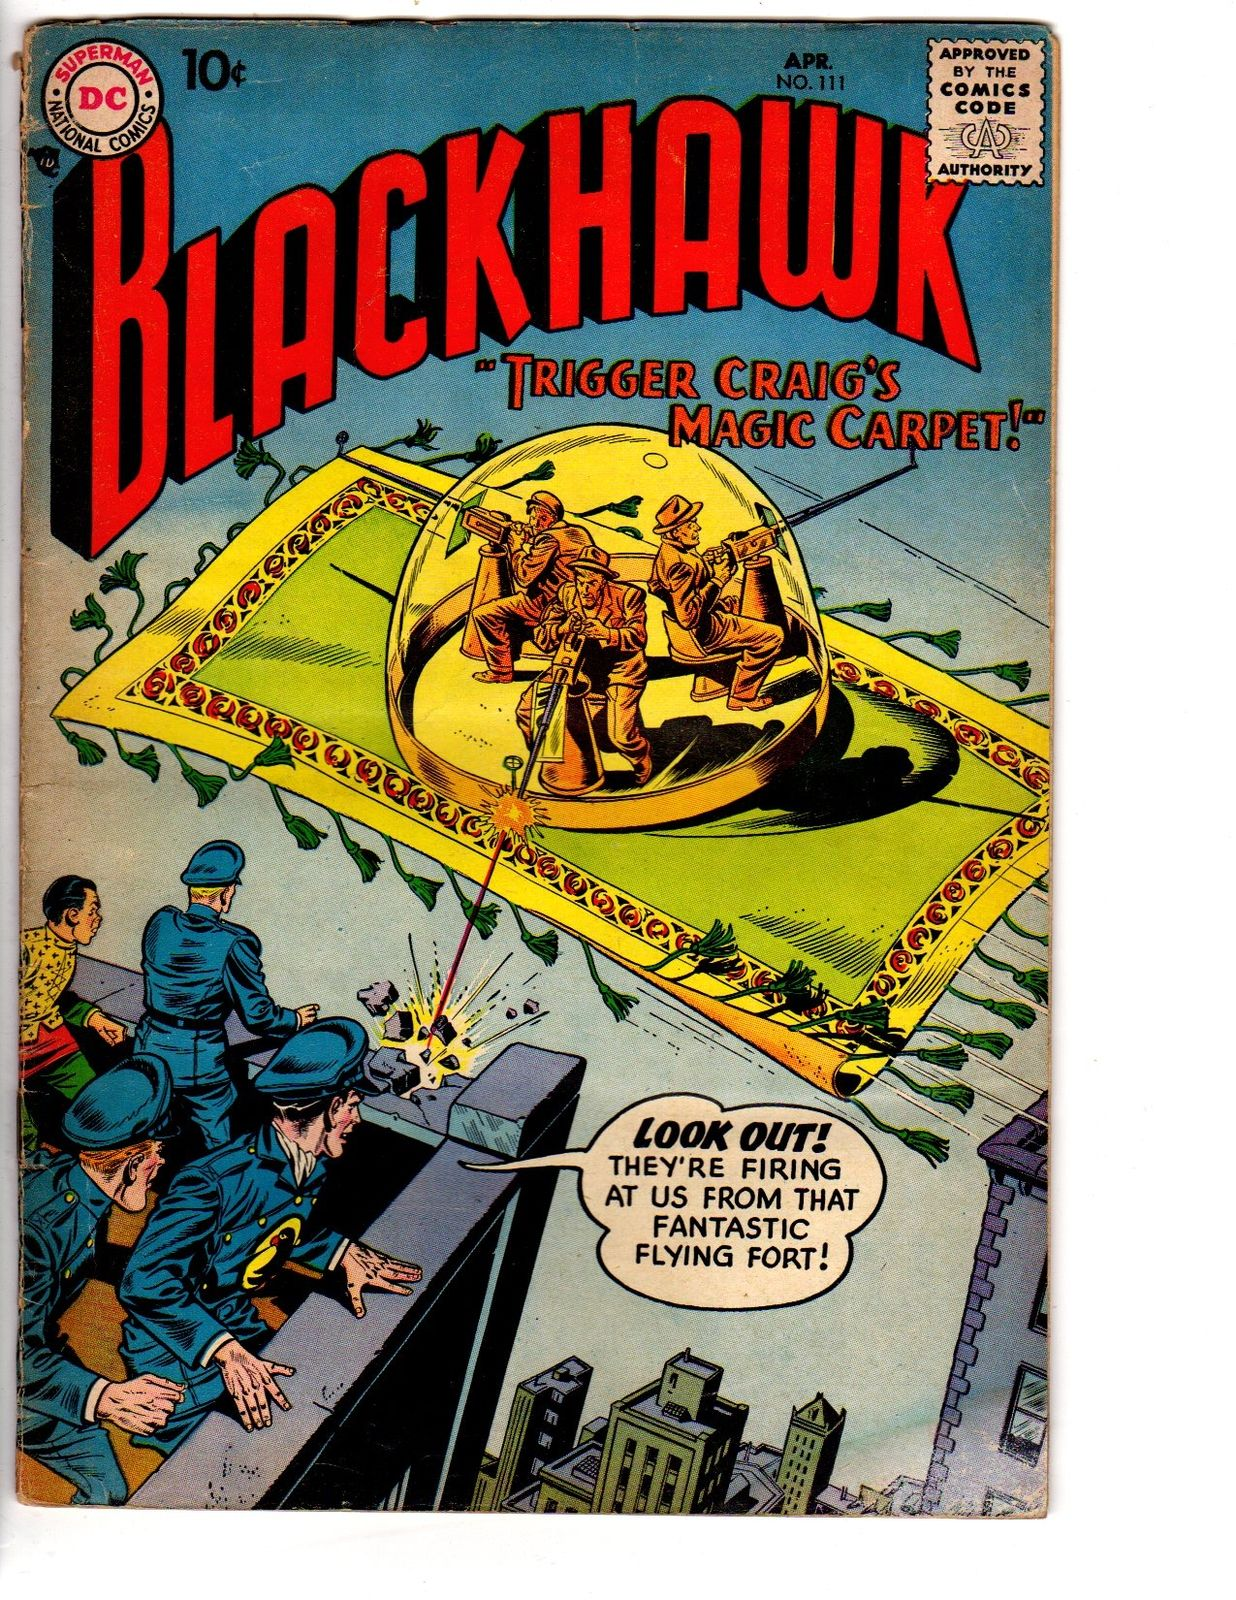 BLACKHAWK 111 G-VG April 1957 / HipComic